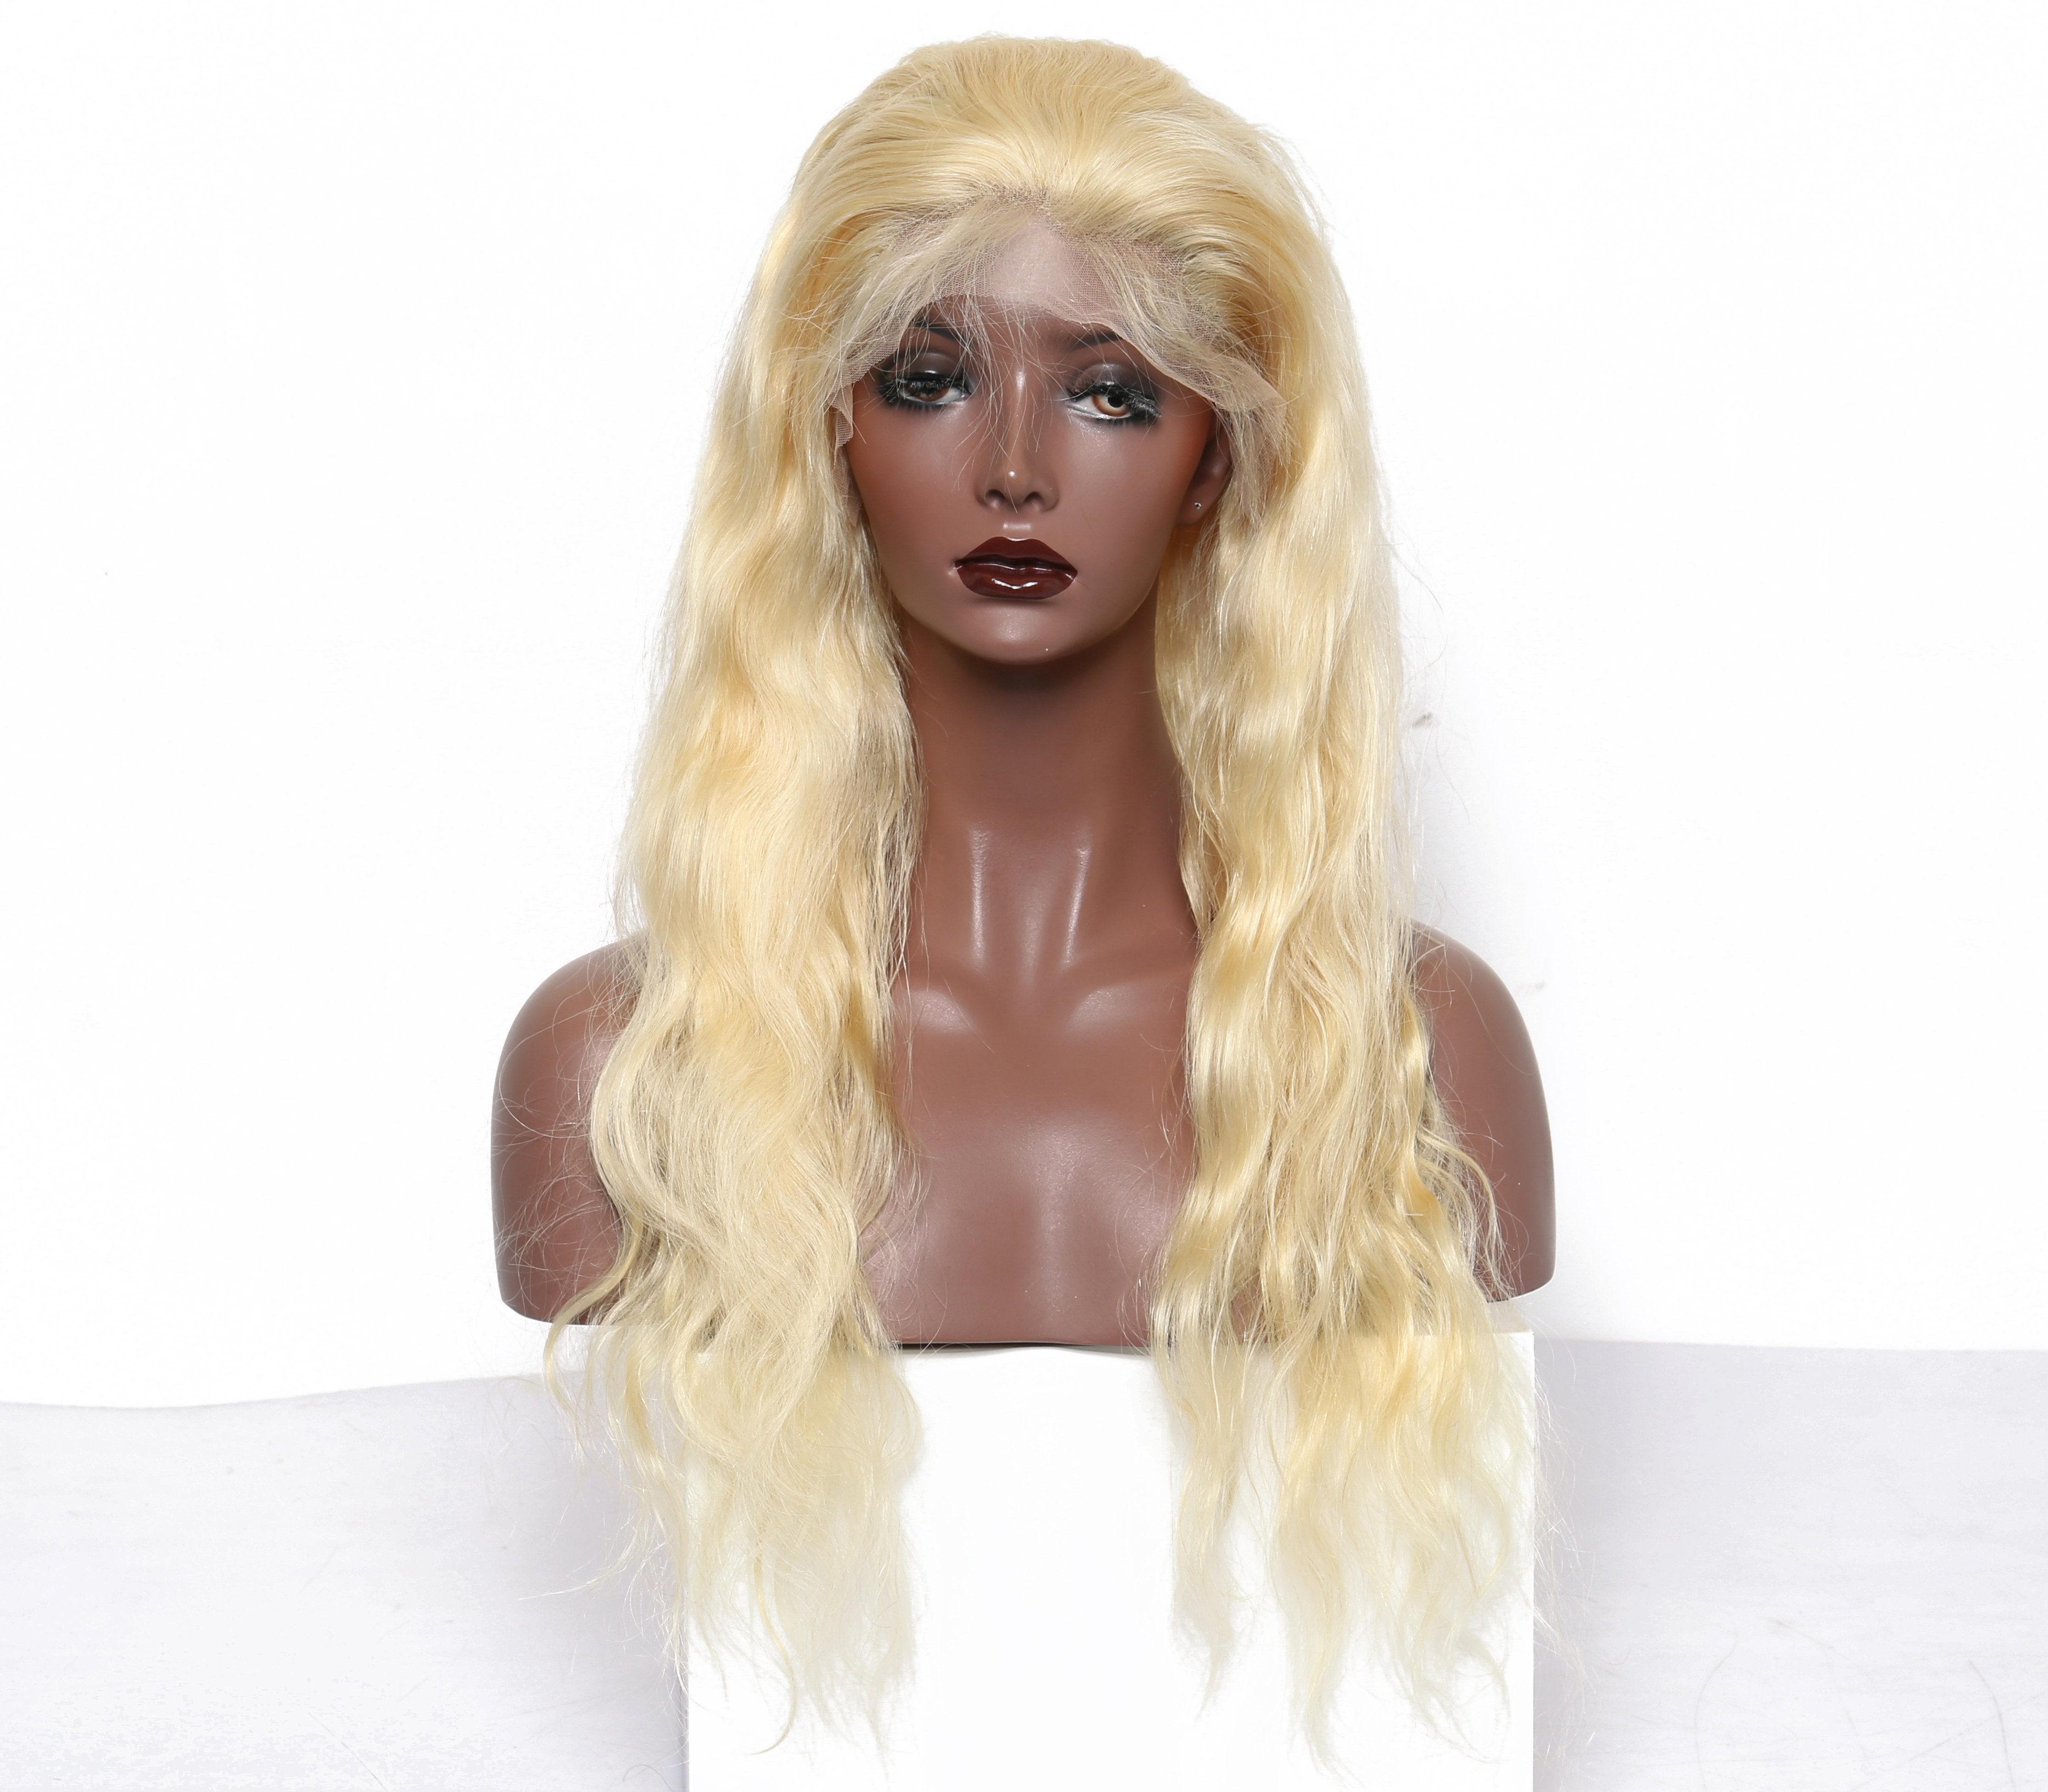 Brazilian virgin hair big body wave blond color 613 lace front brazilian virgin hair big body wave blond color 613 lace front human hair wigs solutioingenieria Choice Image